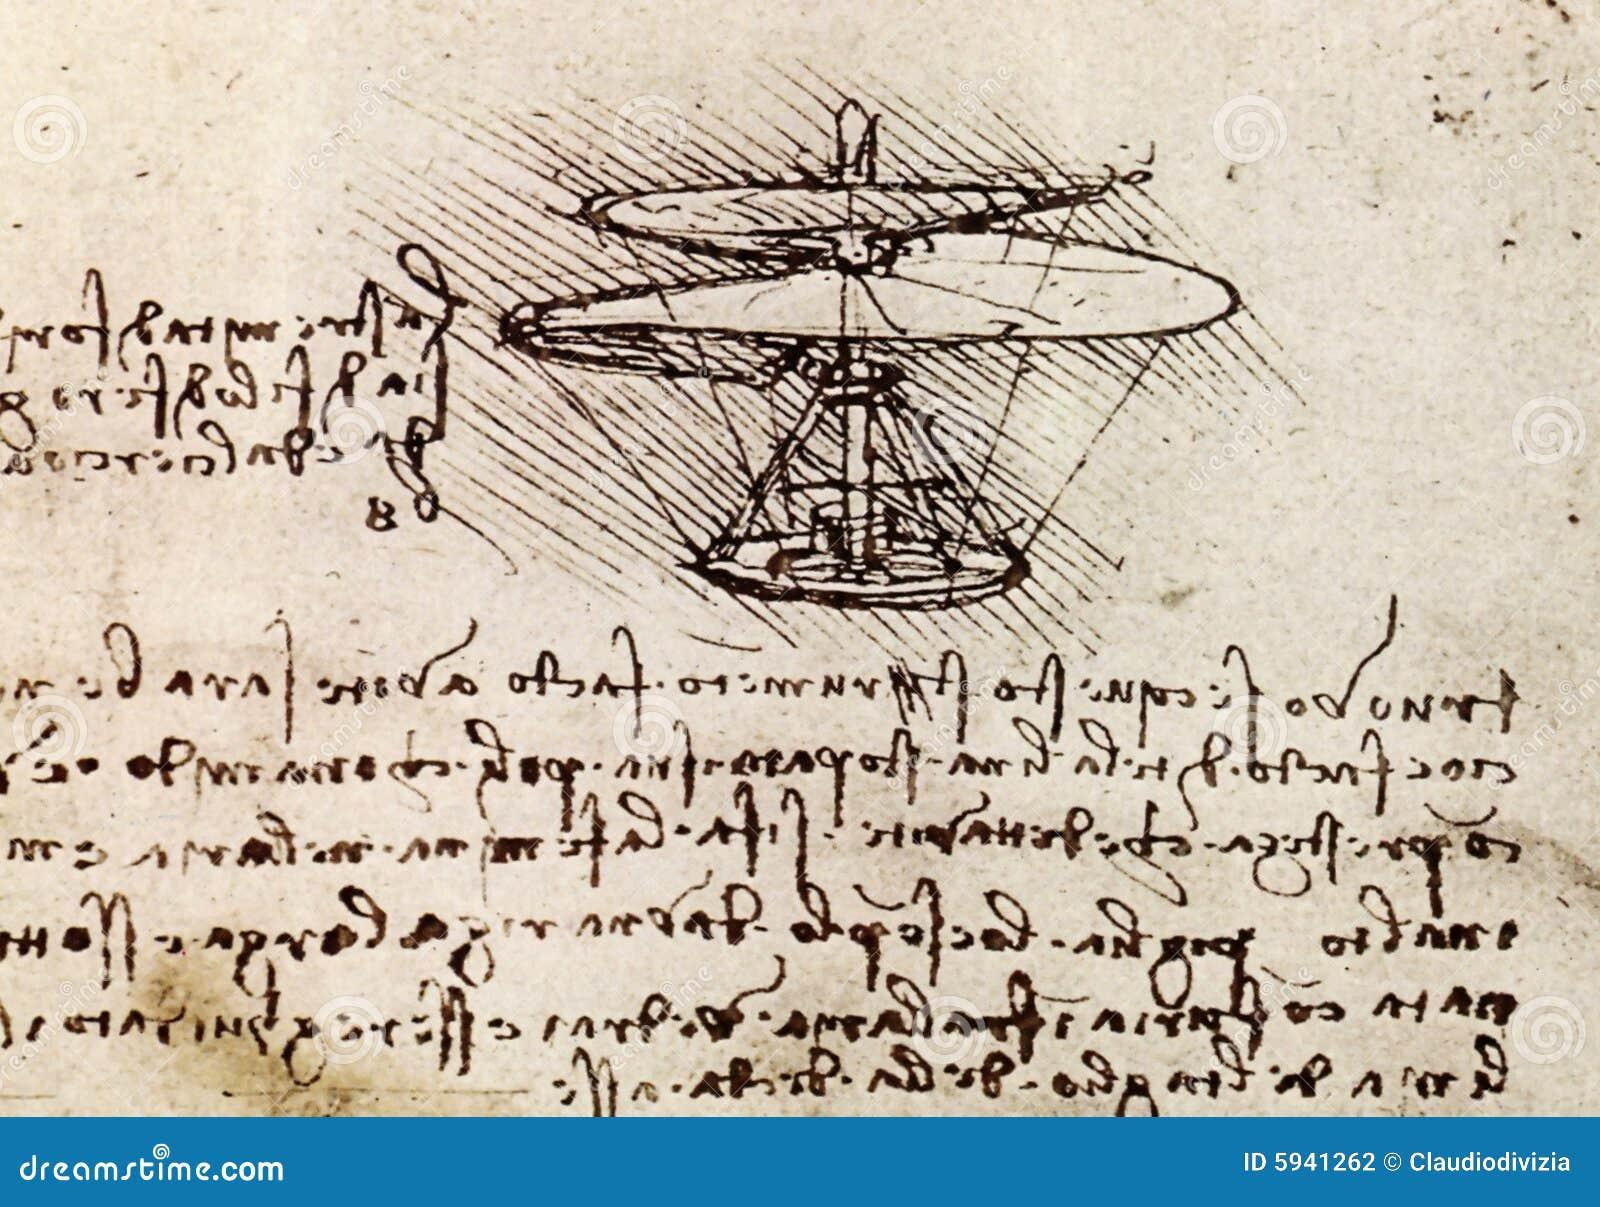 Leonardo da vinci research paper